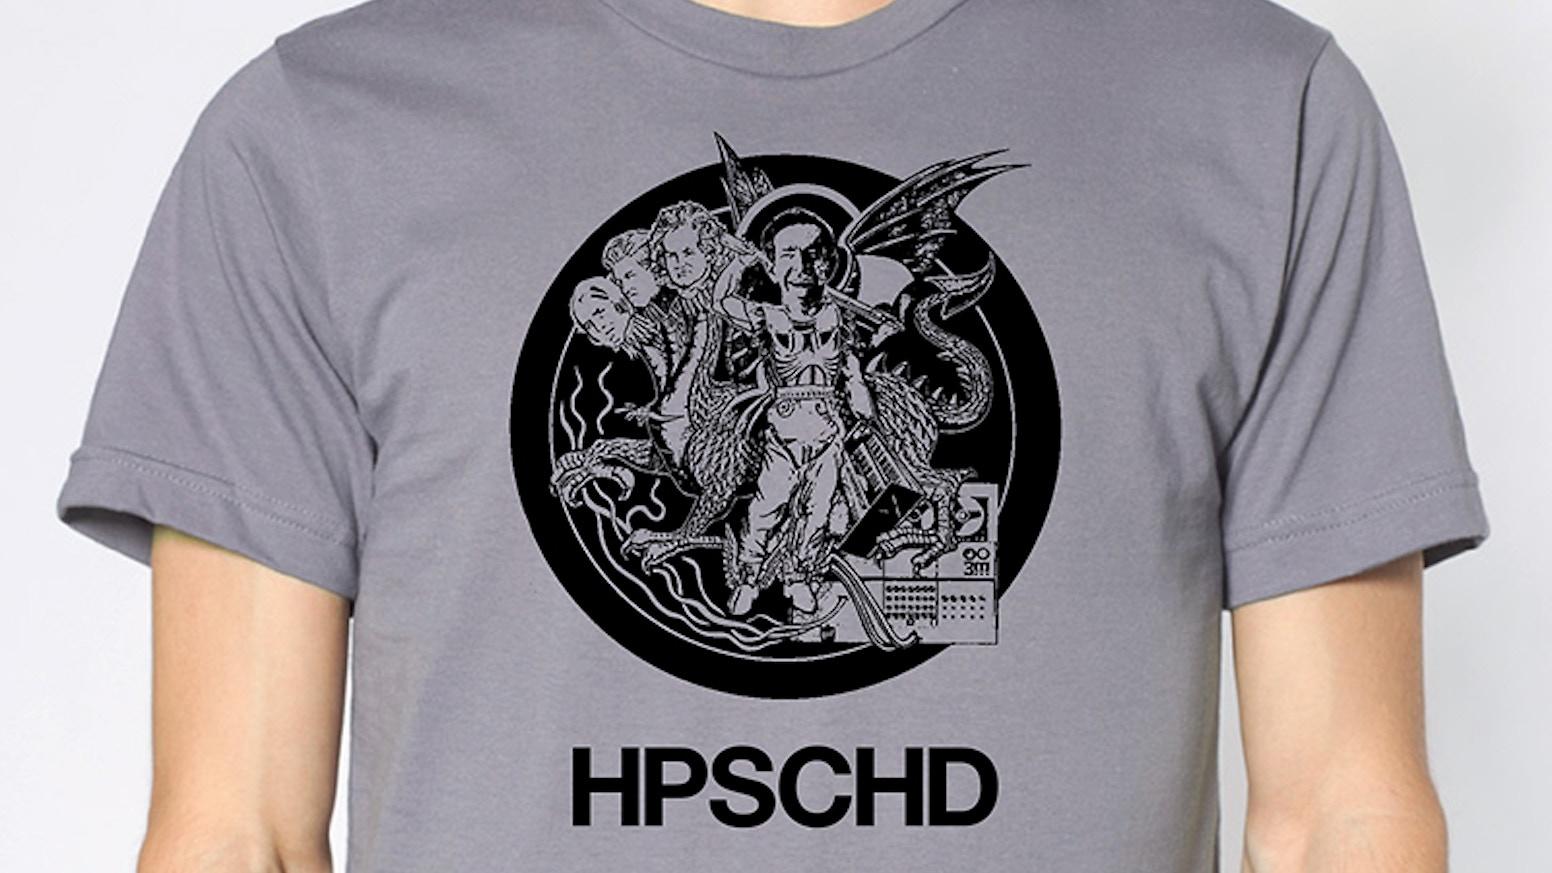 Hpschd Dragonslayer Tee By Kayrock Screenprinting By Darmstadt